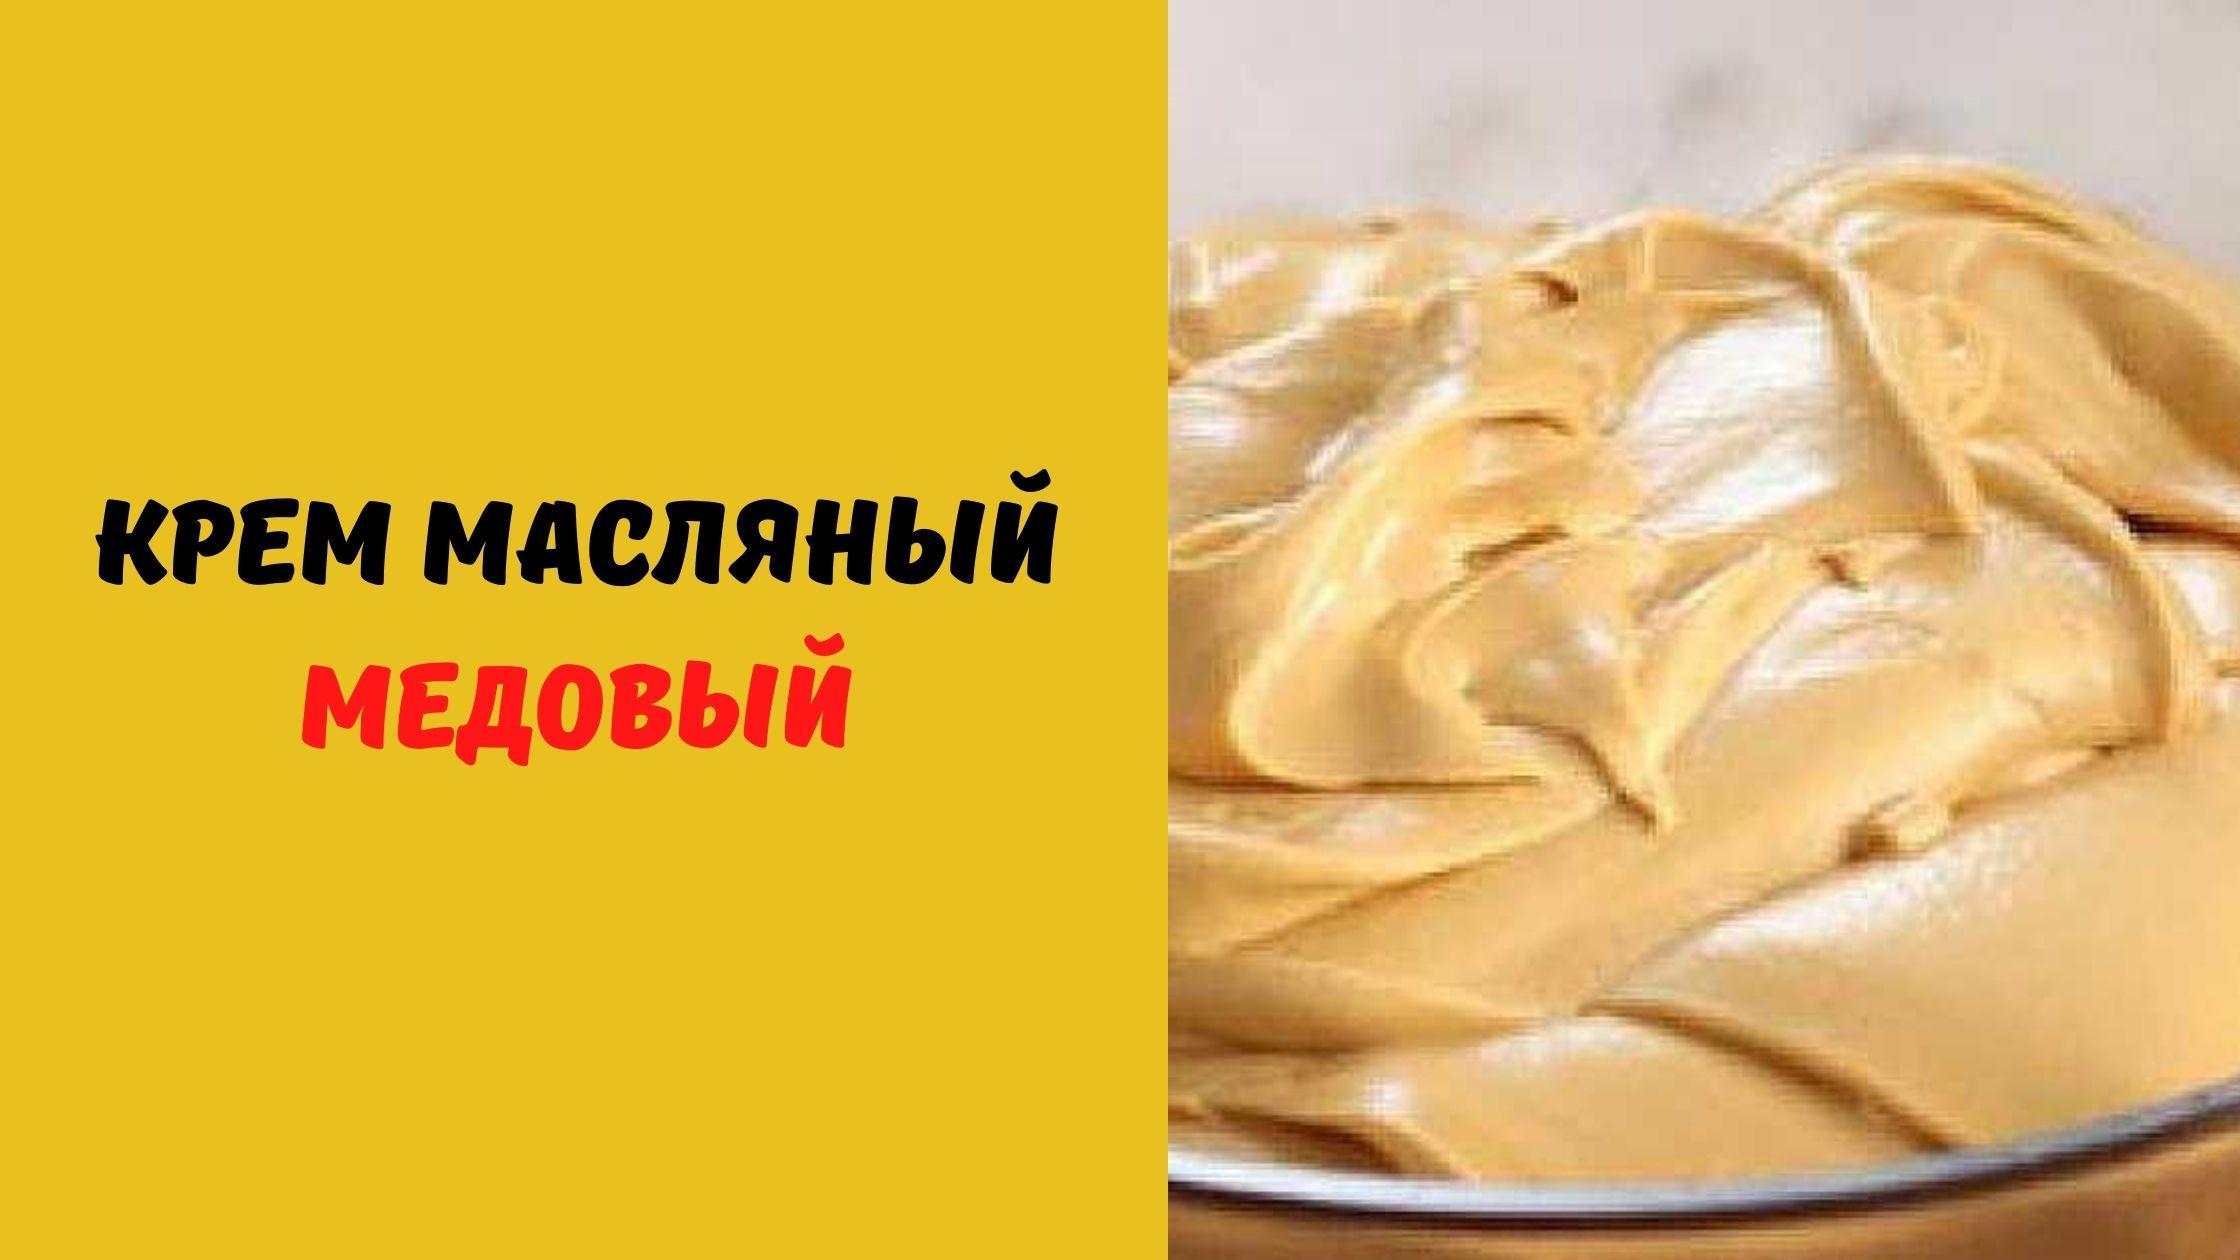 медово масляный крем